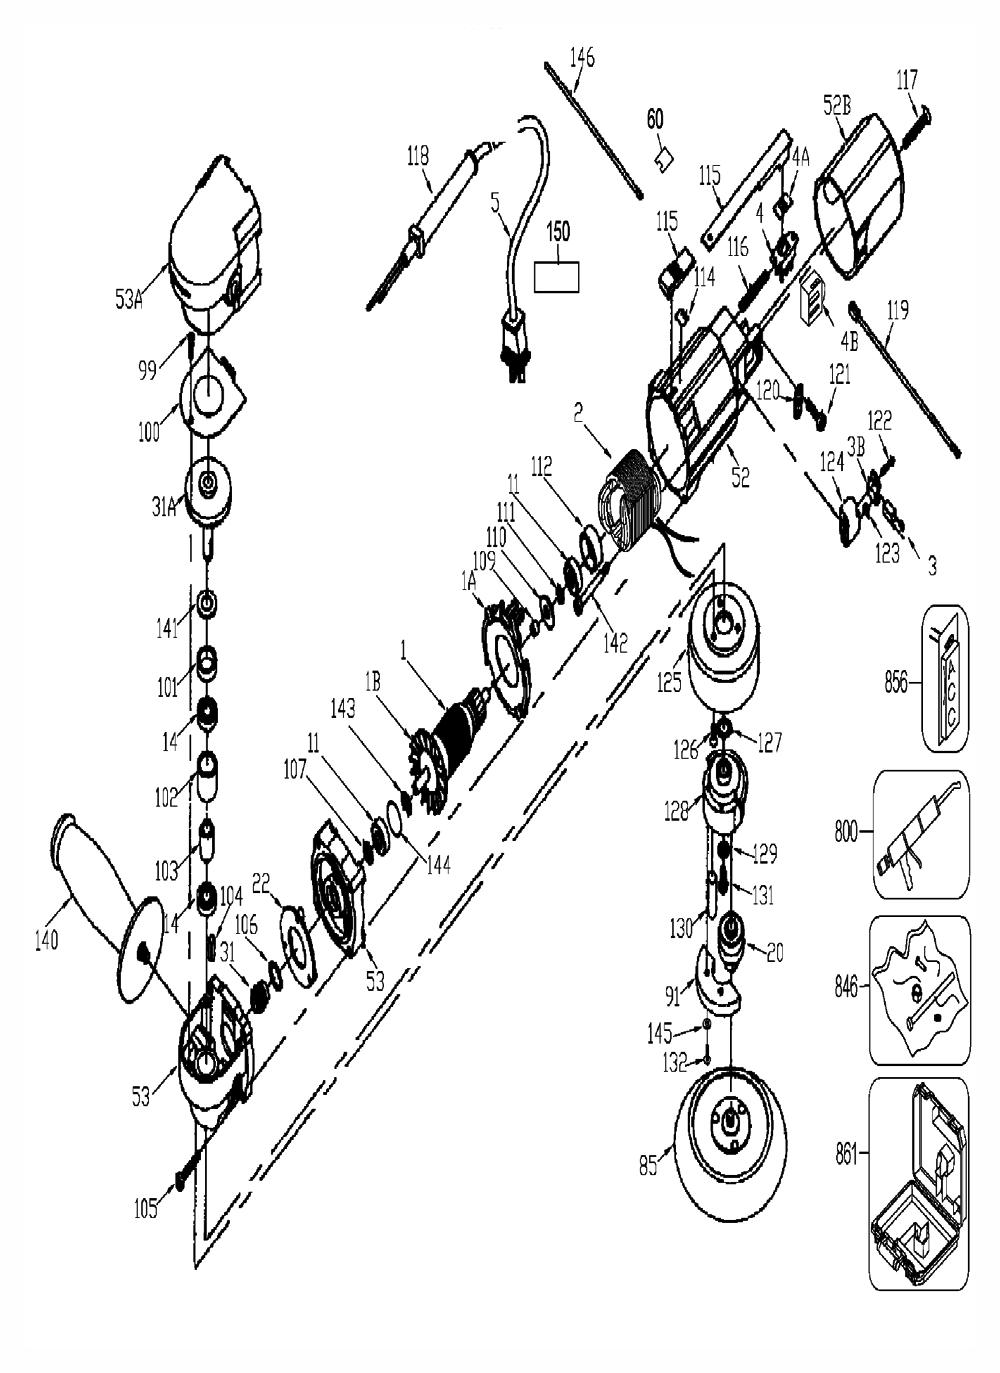 Buy Porter Cable J-7334 Type-2 RANDOM ORBIT Replacement